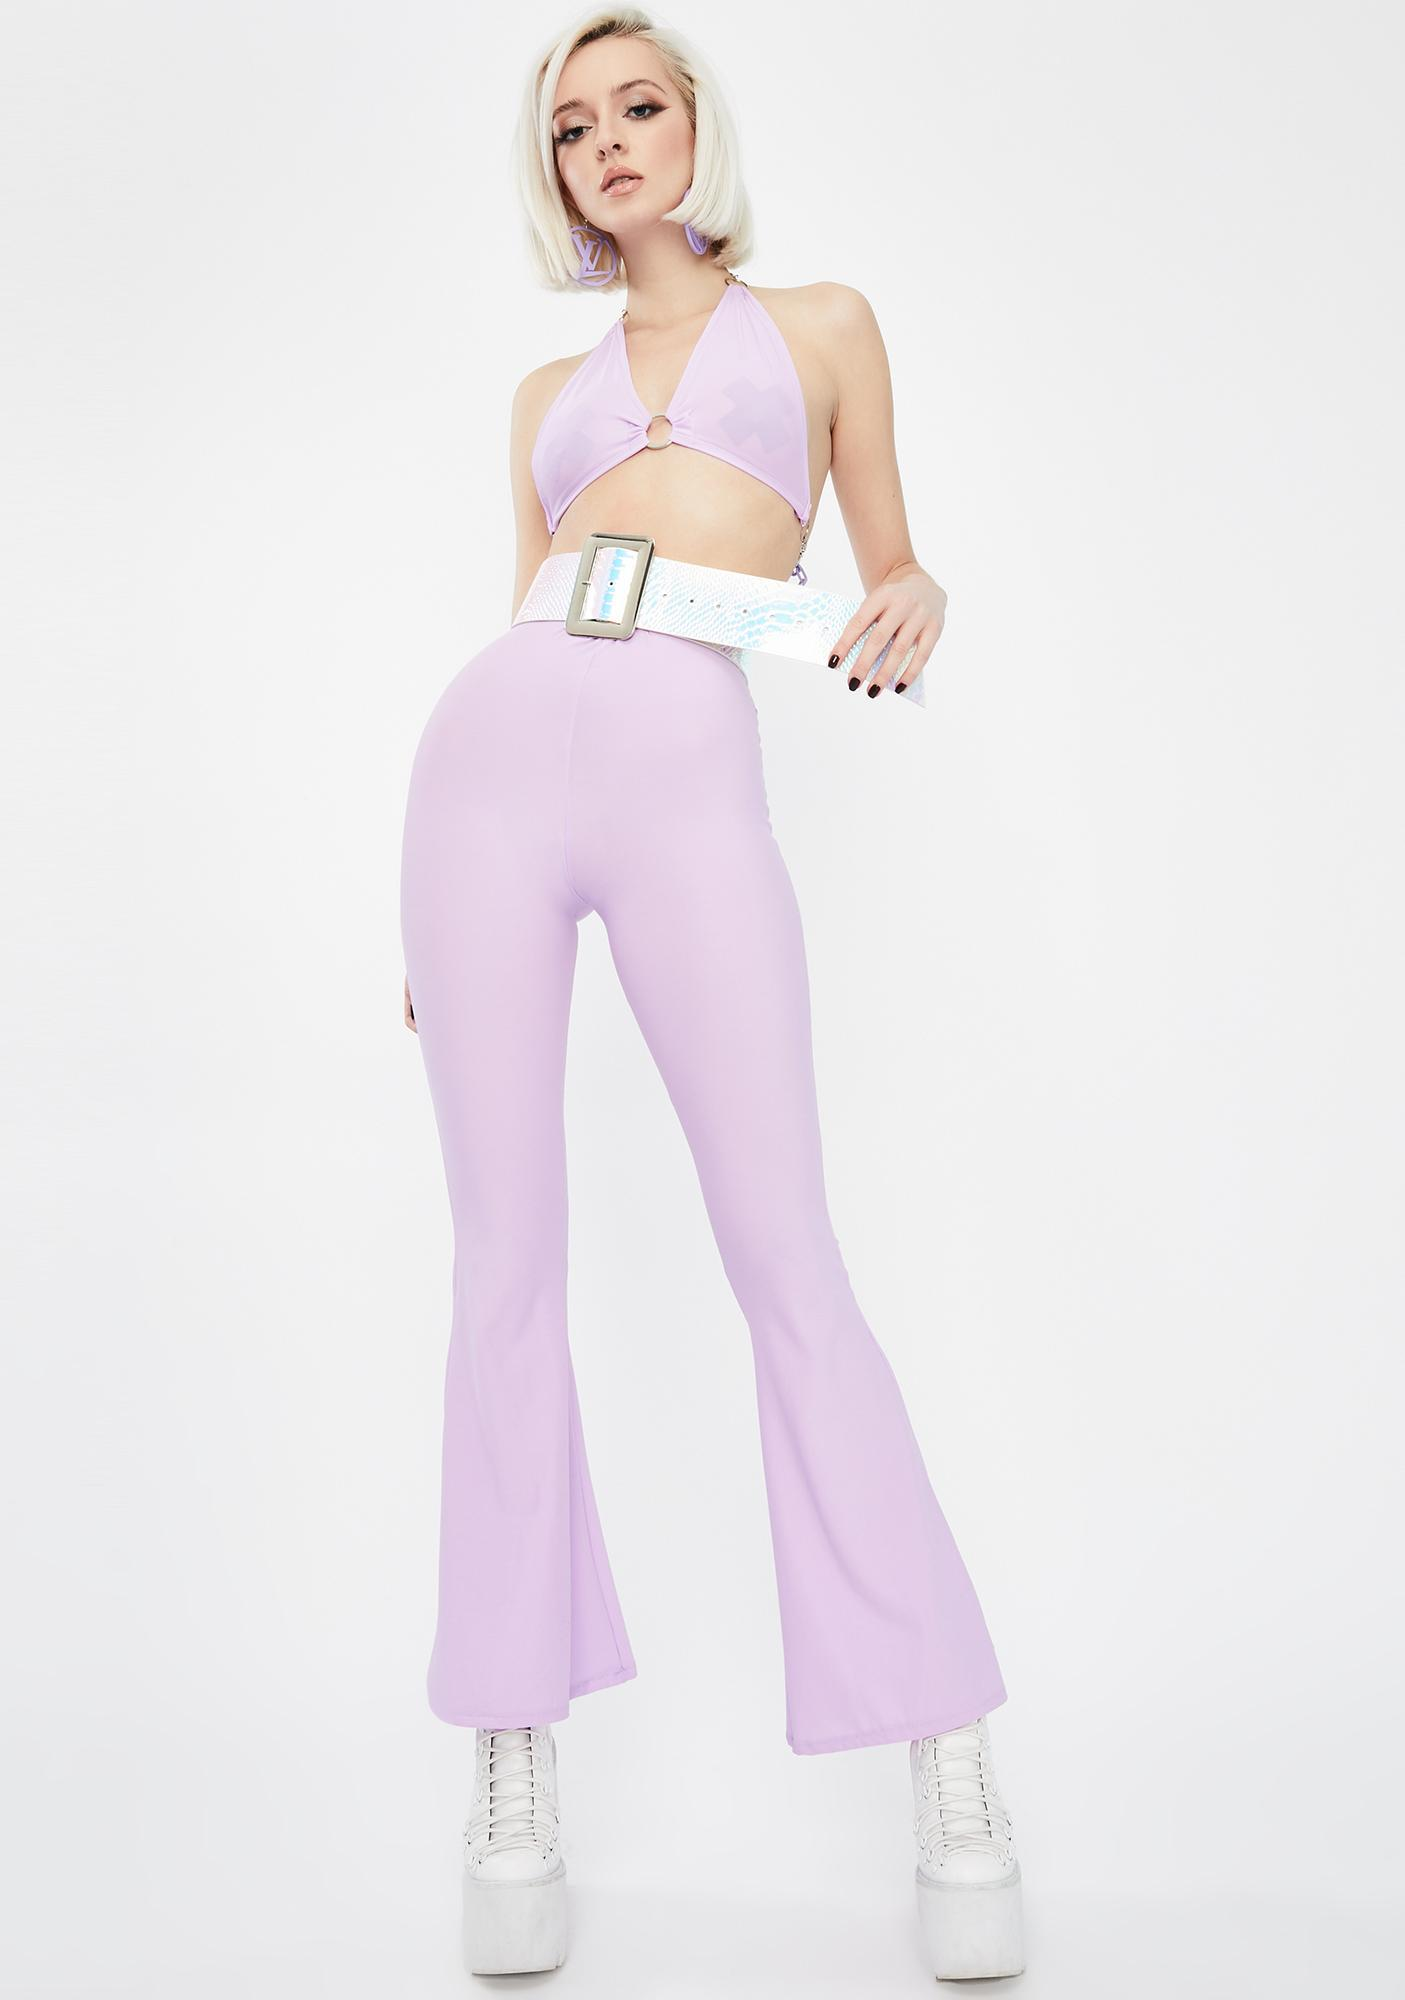 Babydol Clothing  Lilac Chain Bra Top